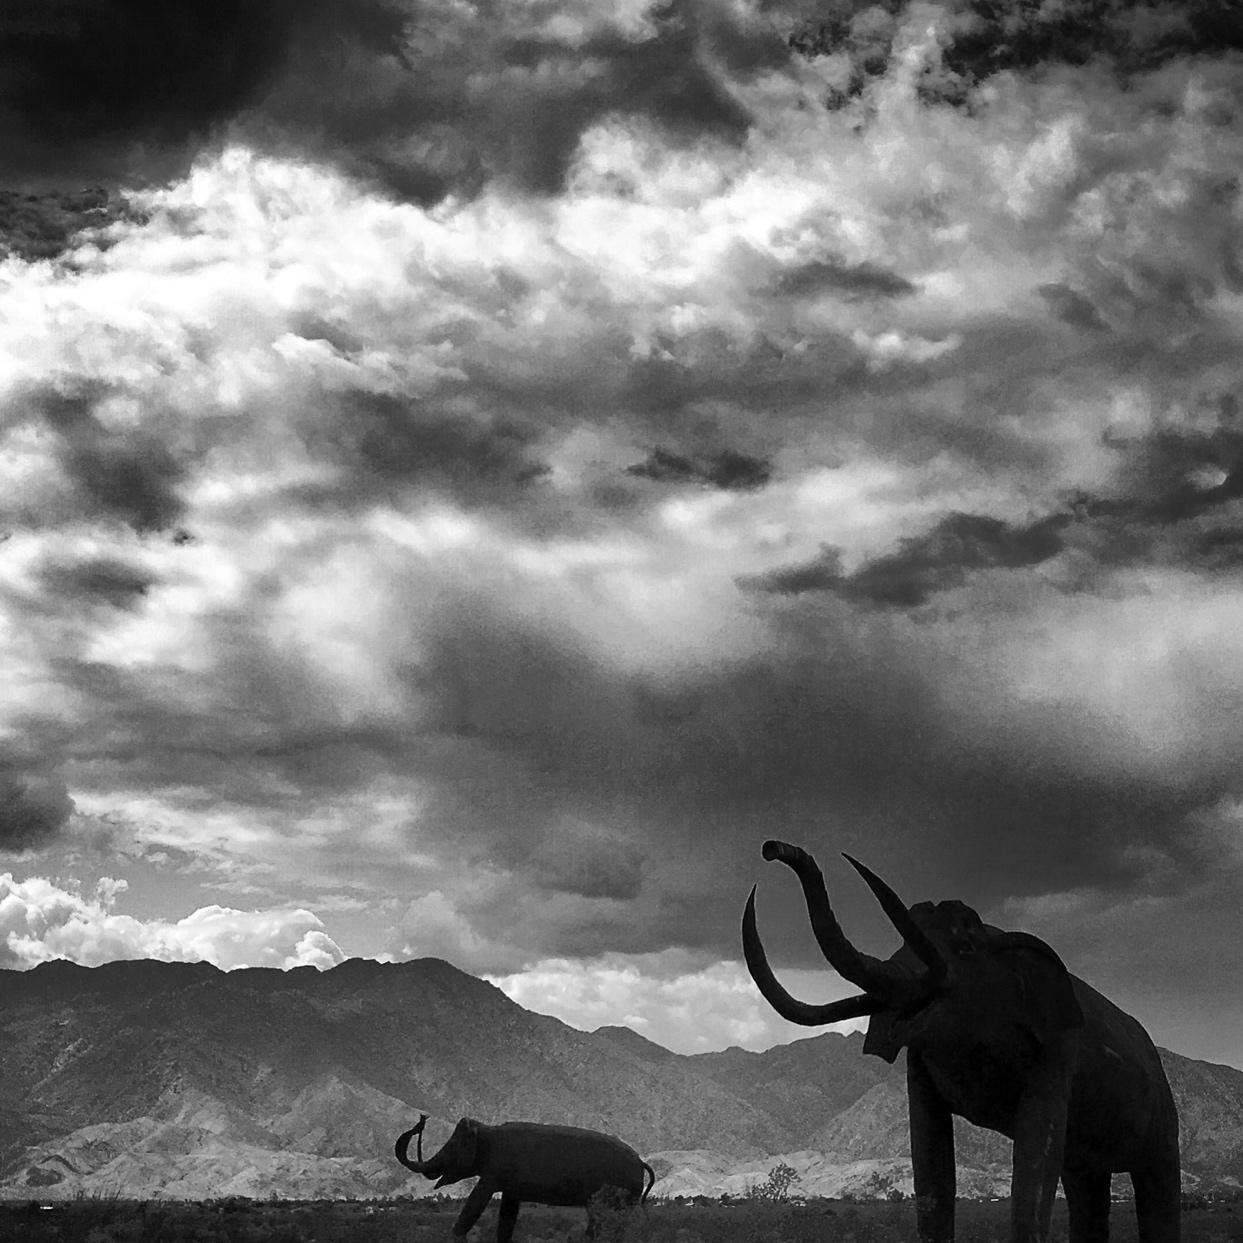 Black and white photo of the Ana-Borrego landscape with giant elephant statues.